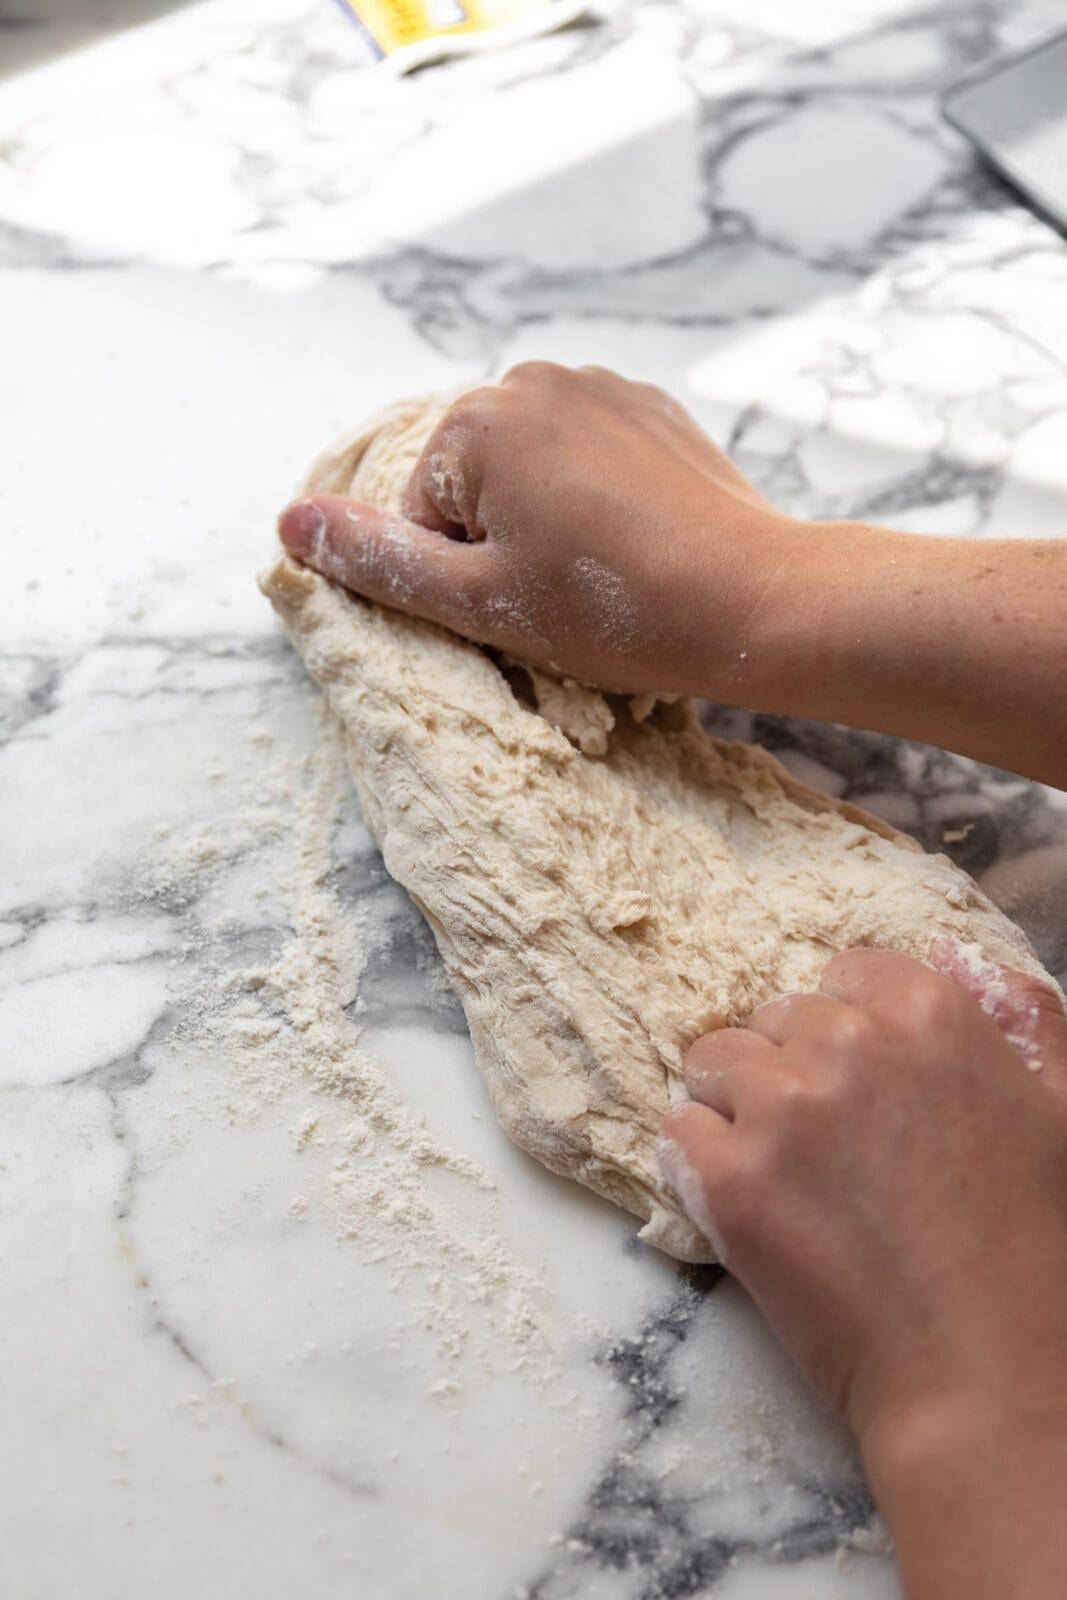 kneading dough